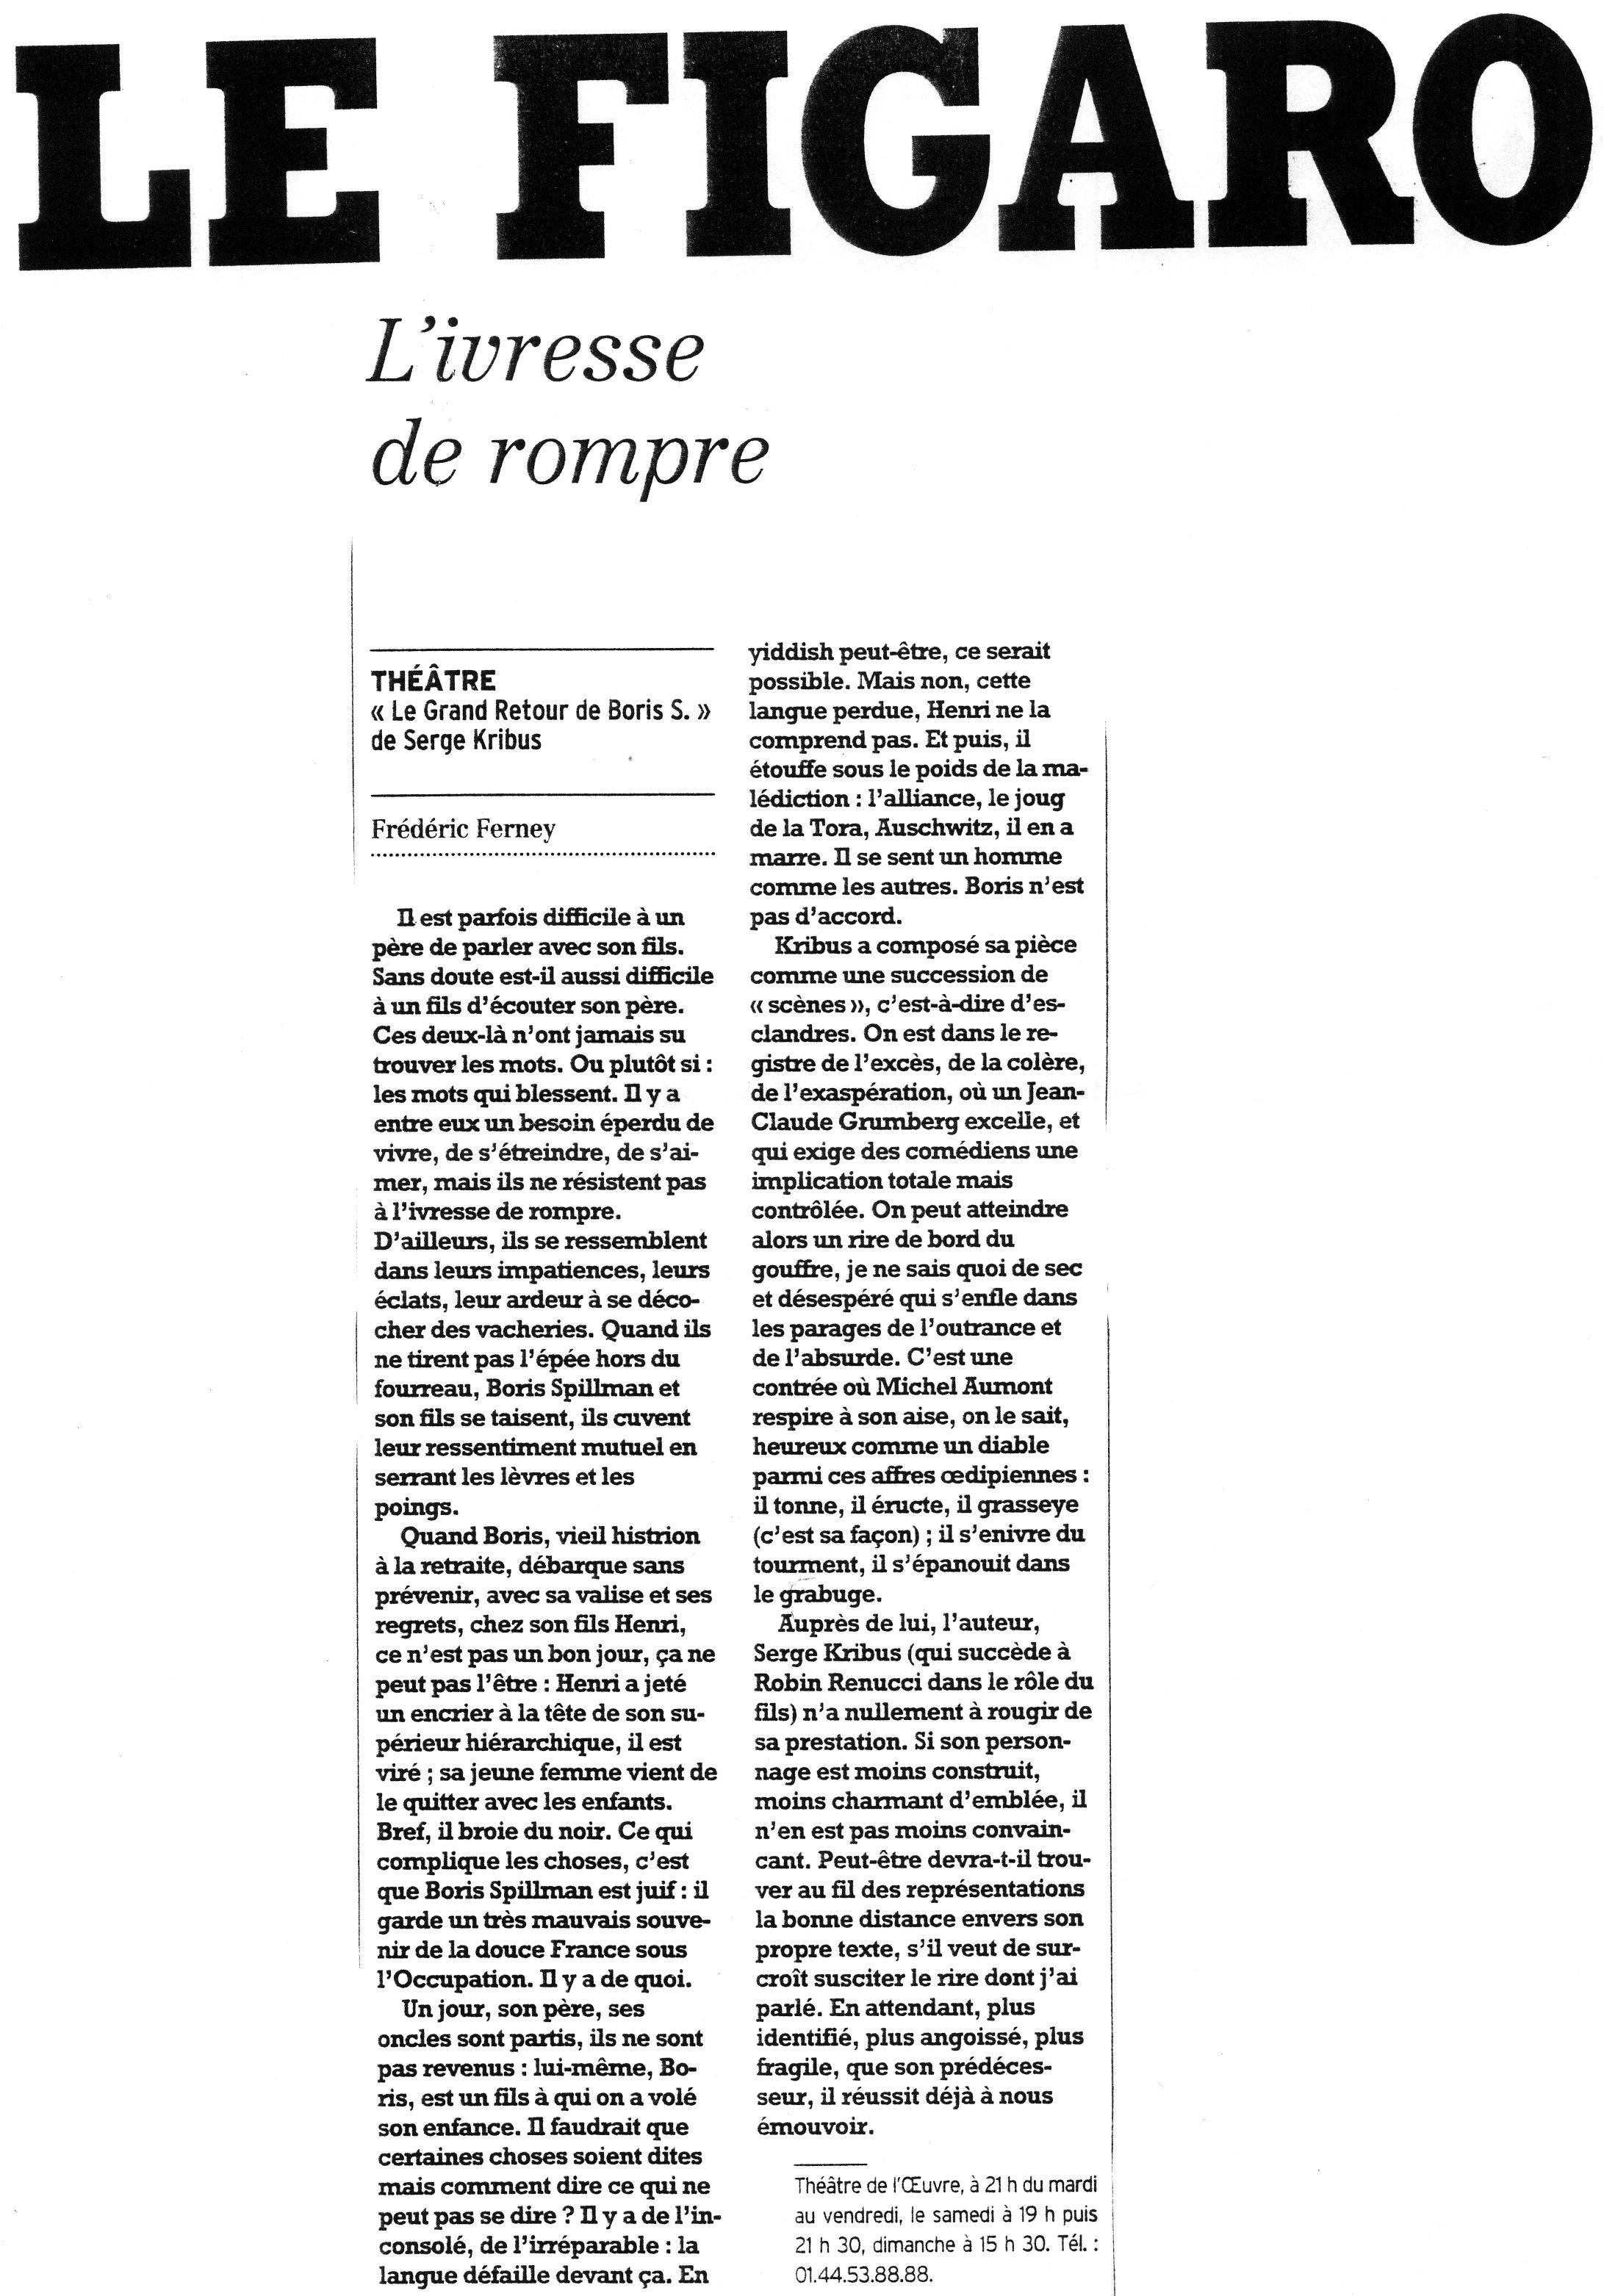 Le Figaro 2.jpg